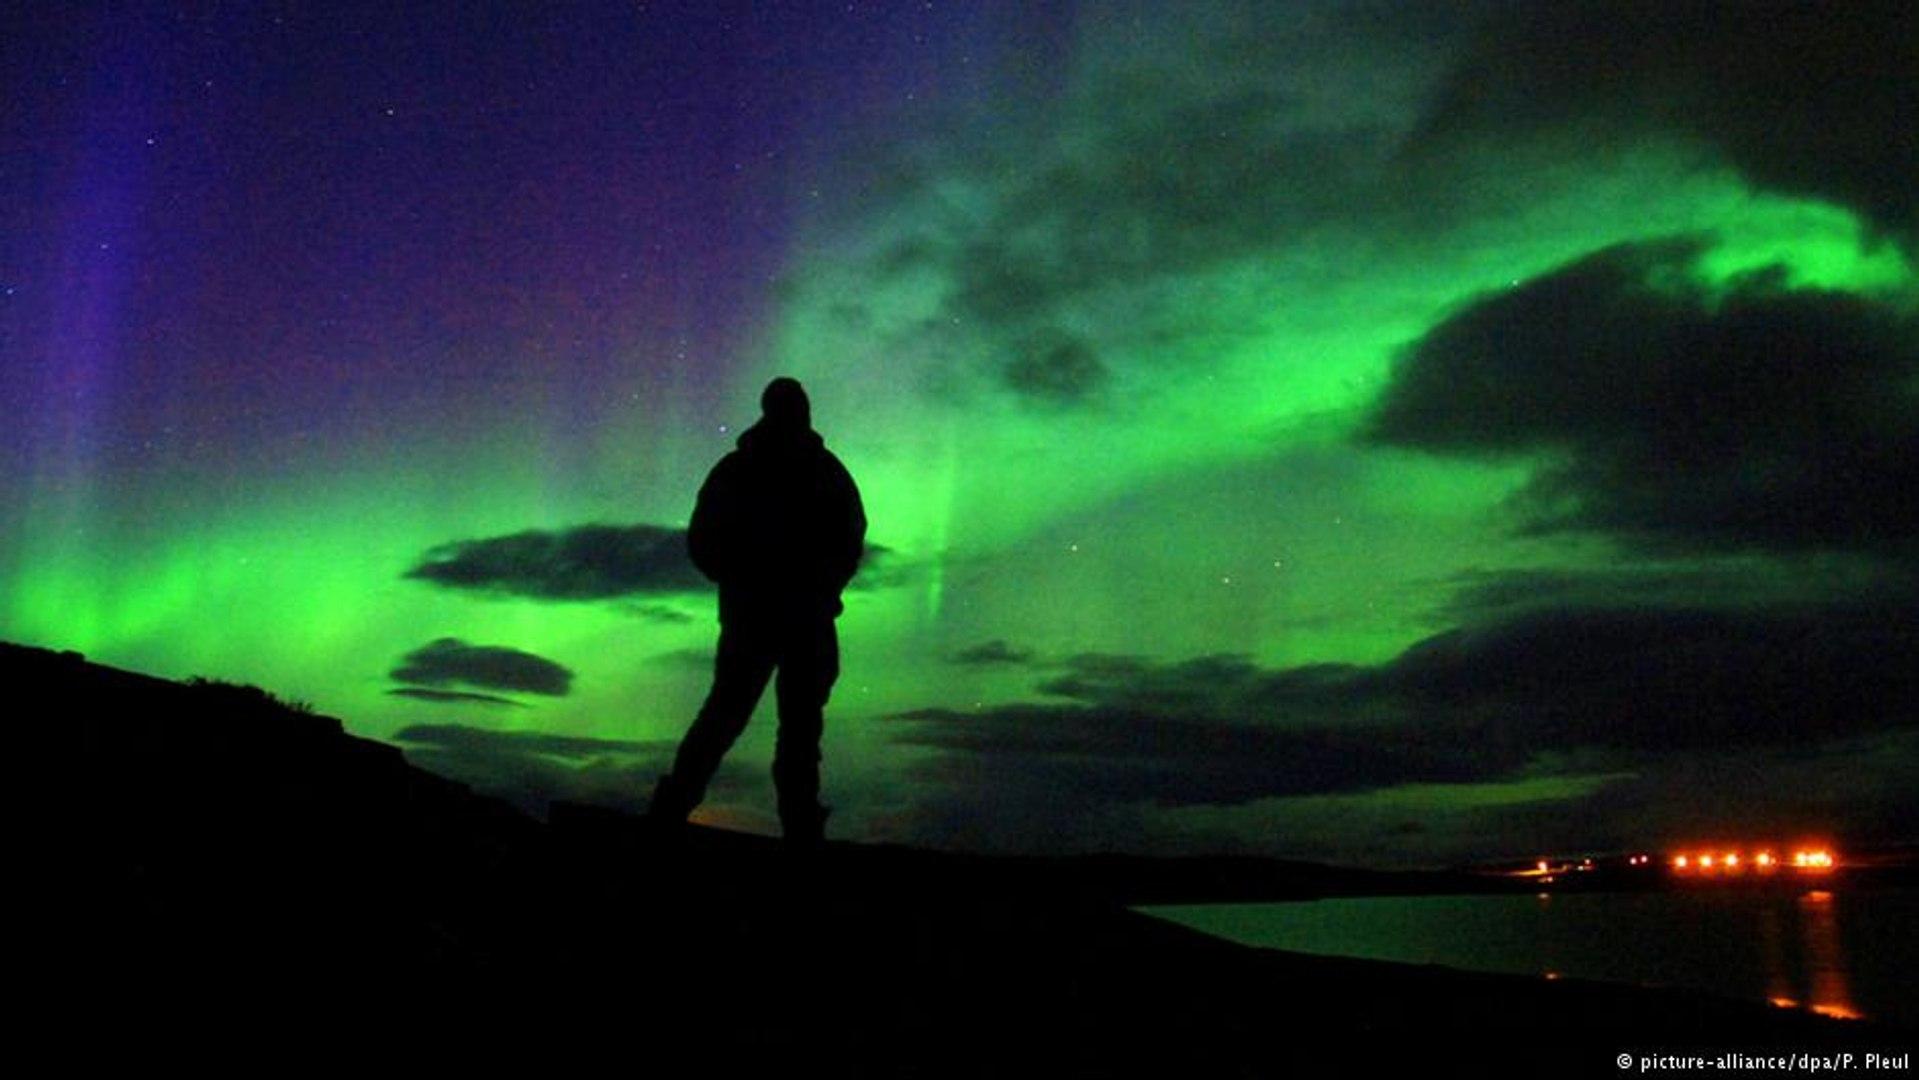 Aurora Boreal ilumina o céu do norte da Finlândia